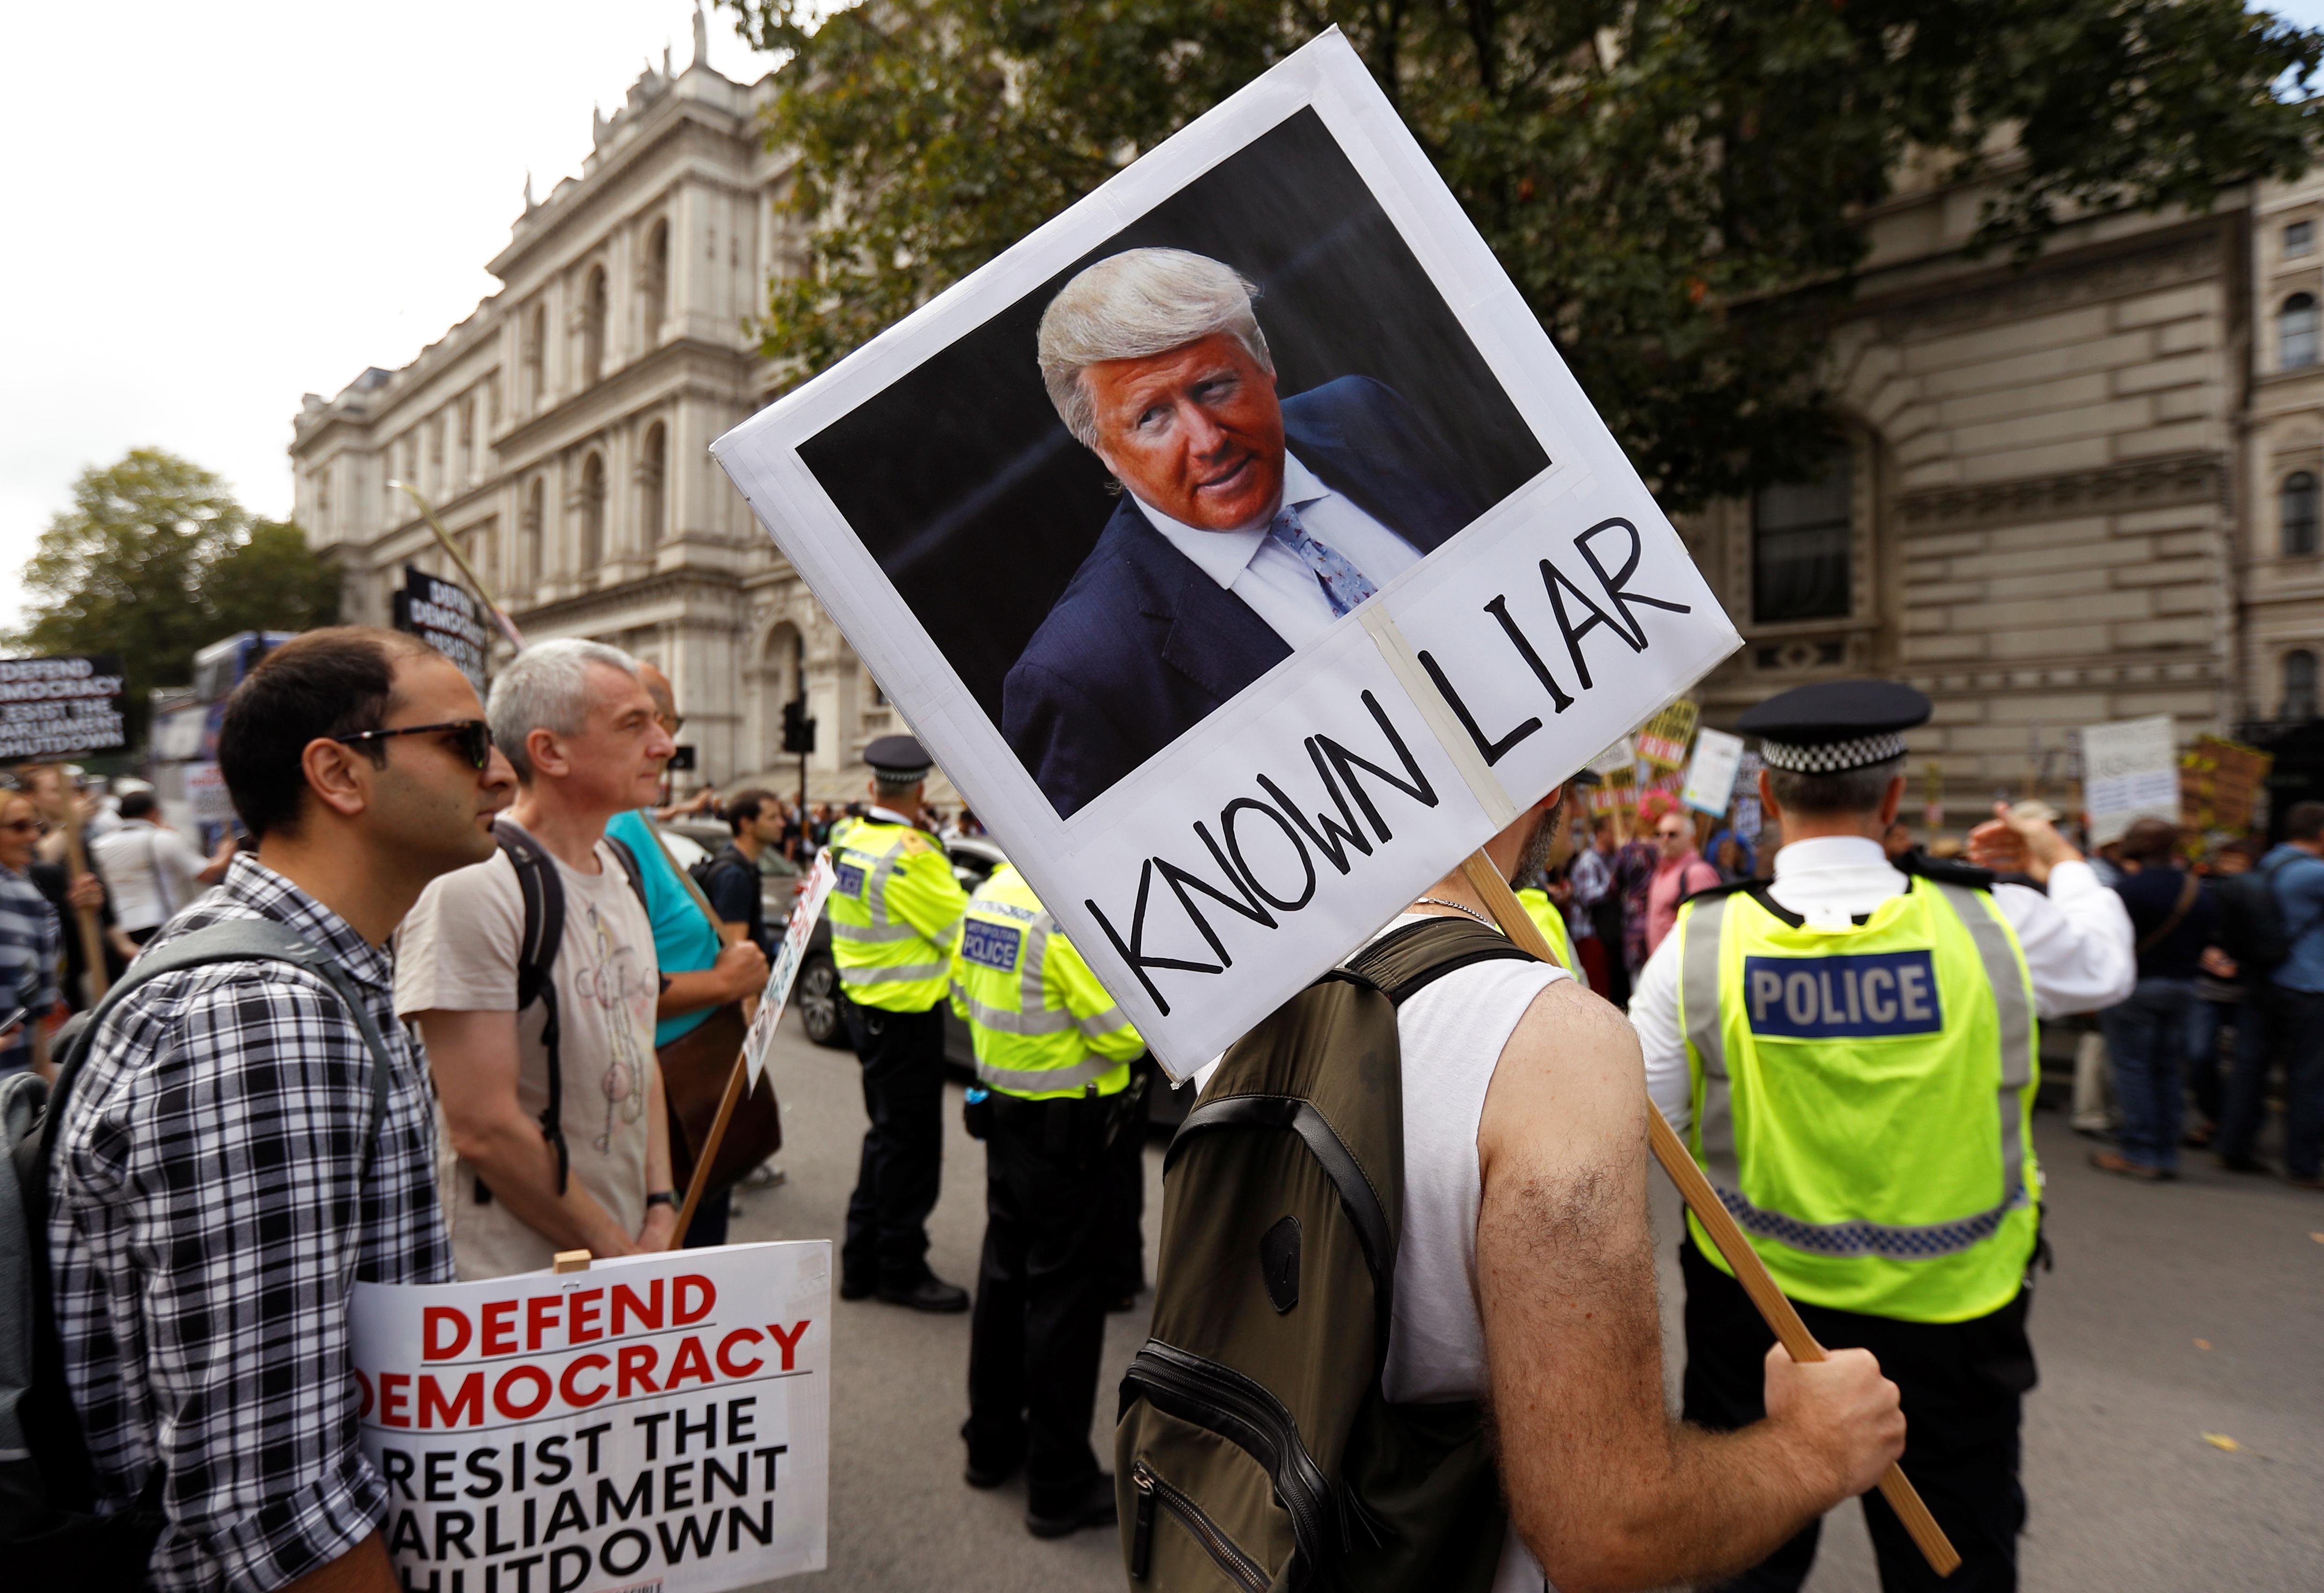 Anti-Brexit protestors demonstrate at Whitehall in London, Britain, August 31, 2019. REUTERS/Peter Nicholls